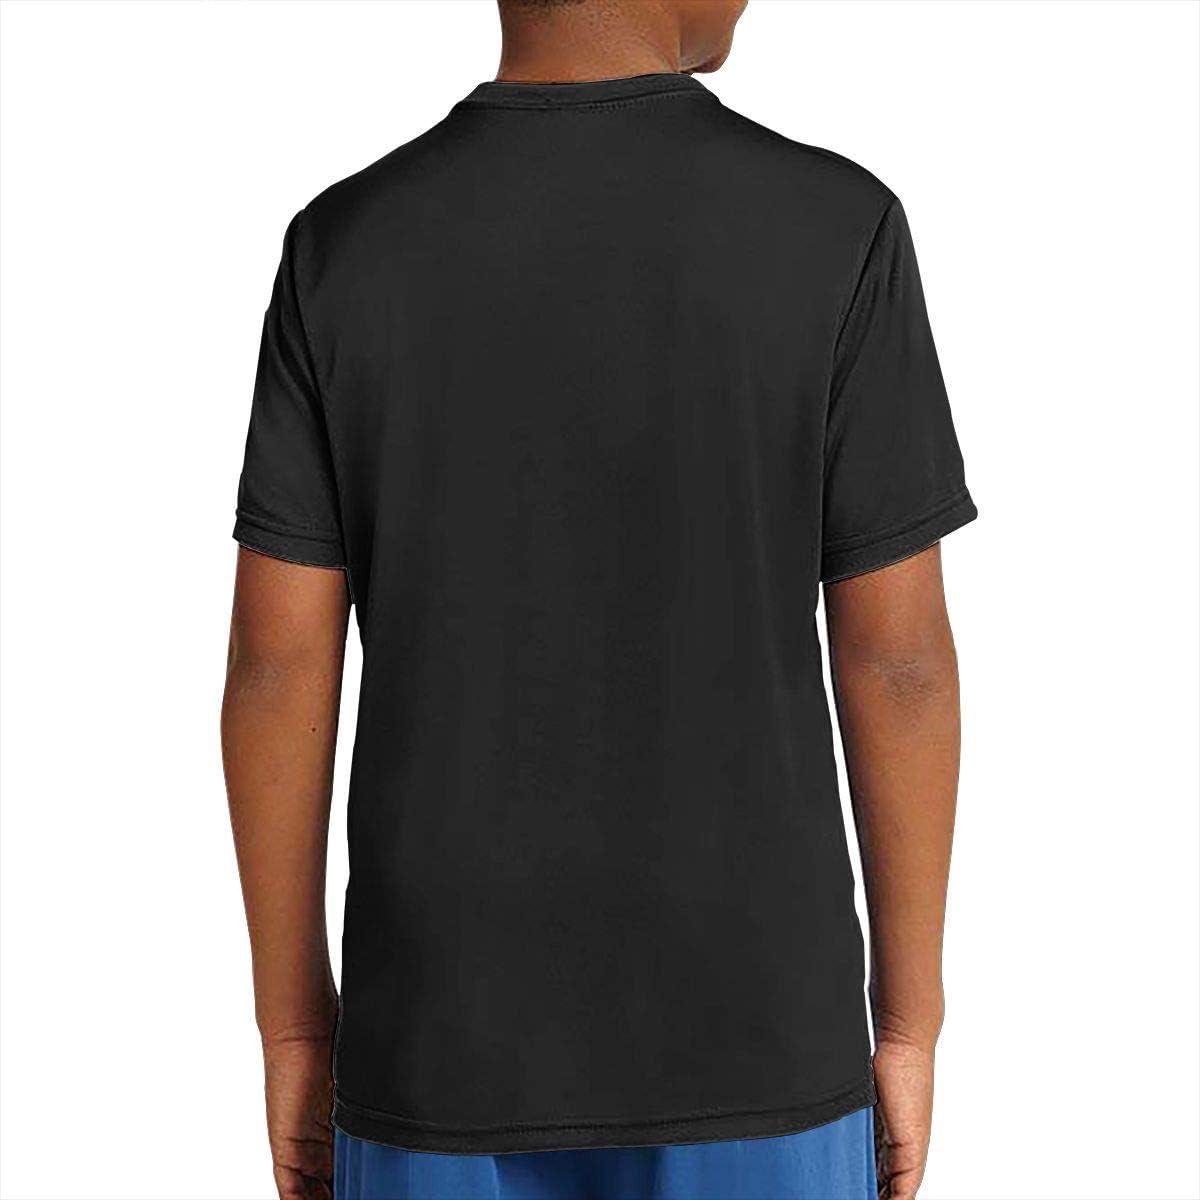 DAVIDLLOYD Borderlands 2 Funny Youth Short Sleeve T-Shirt for Teenager Boys Girls Black